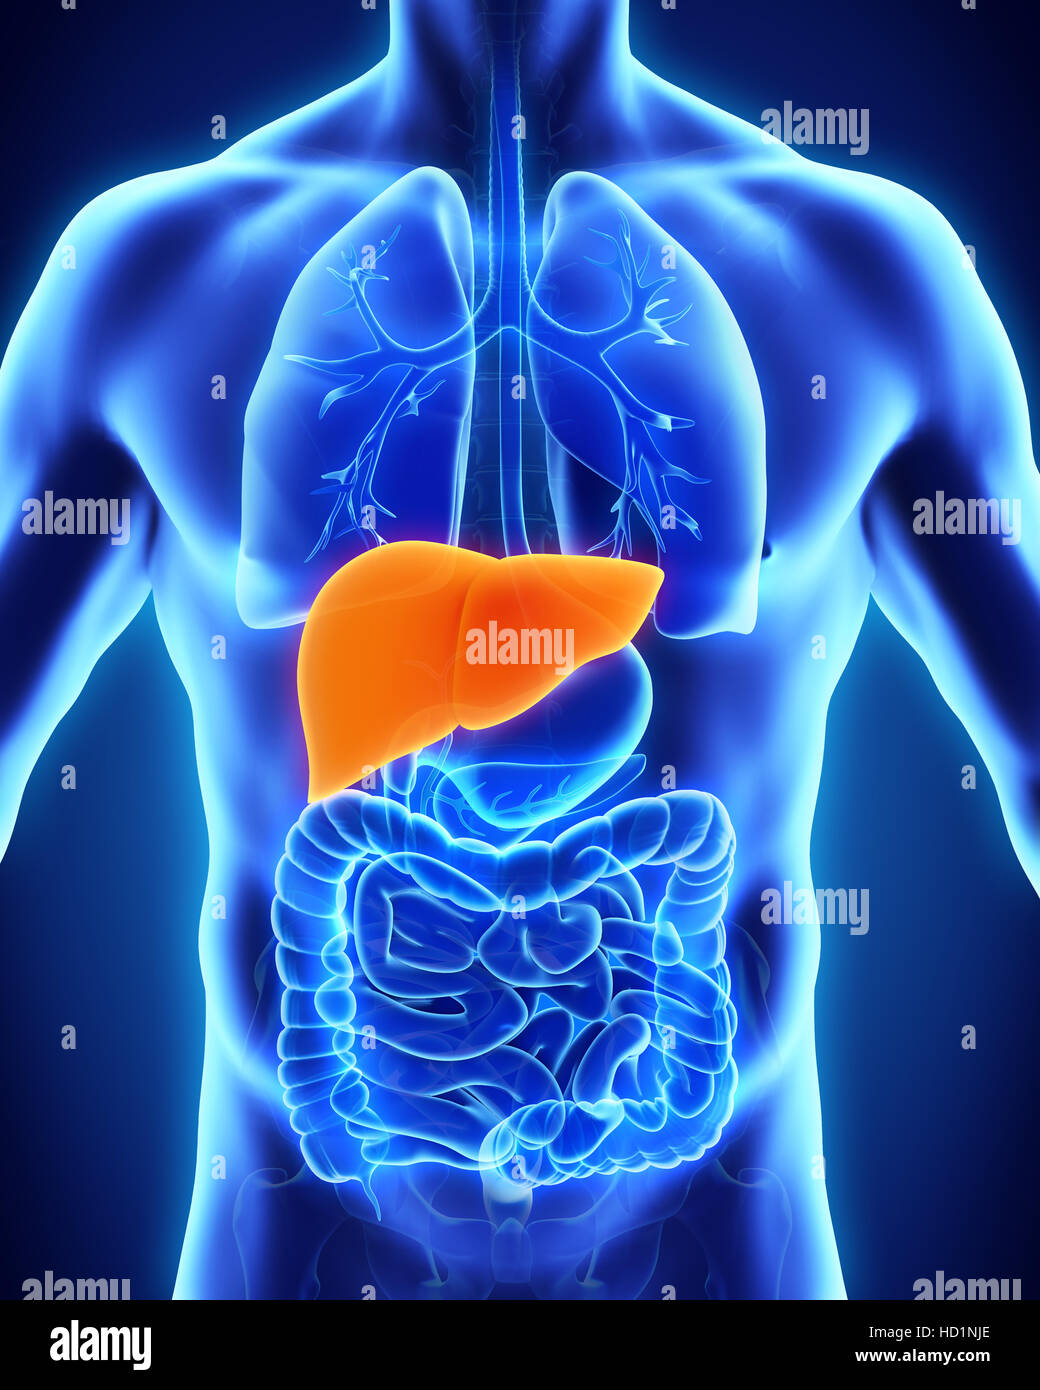 Human Liver Anatomy Stock Photo 128502038 Alamy